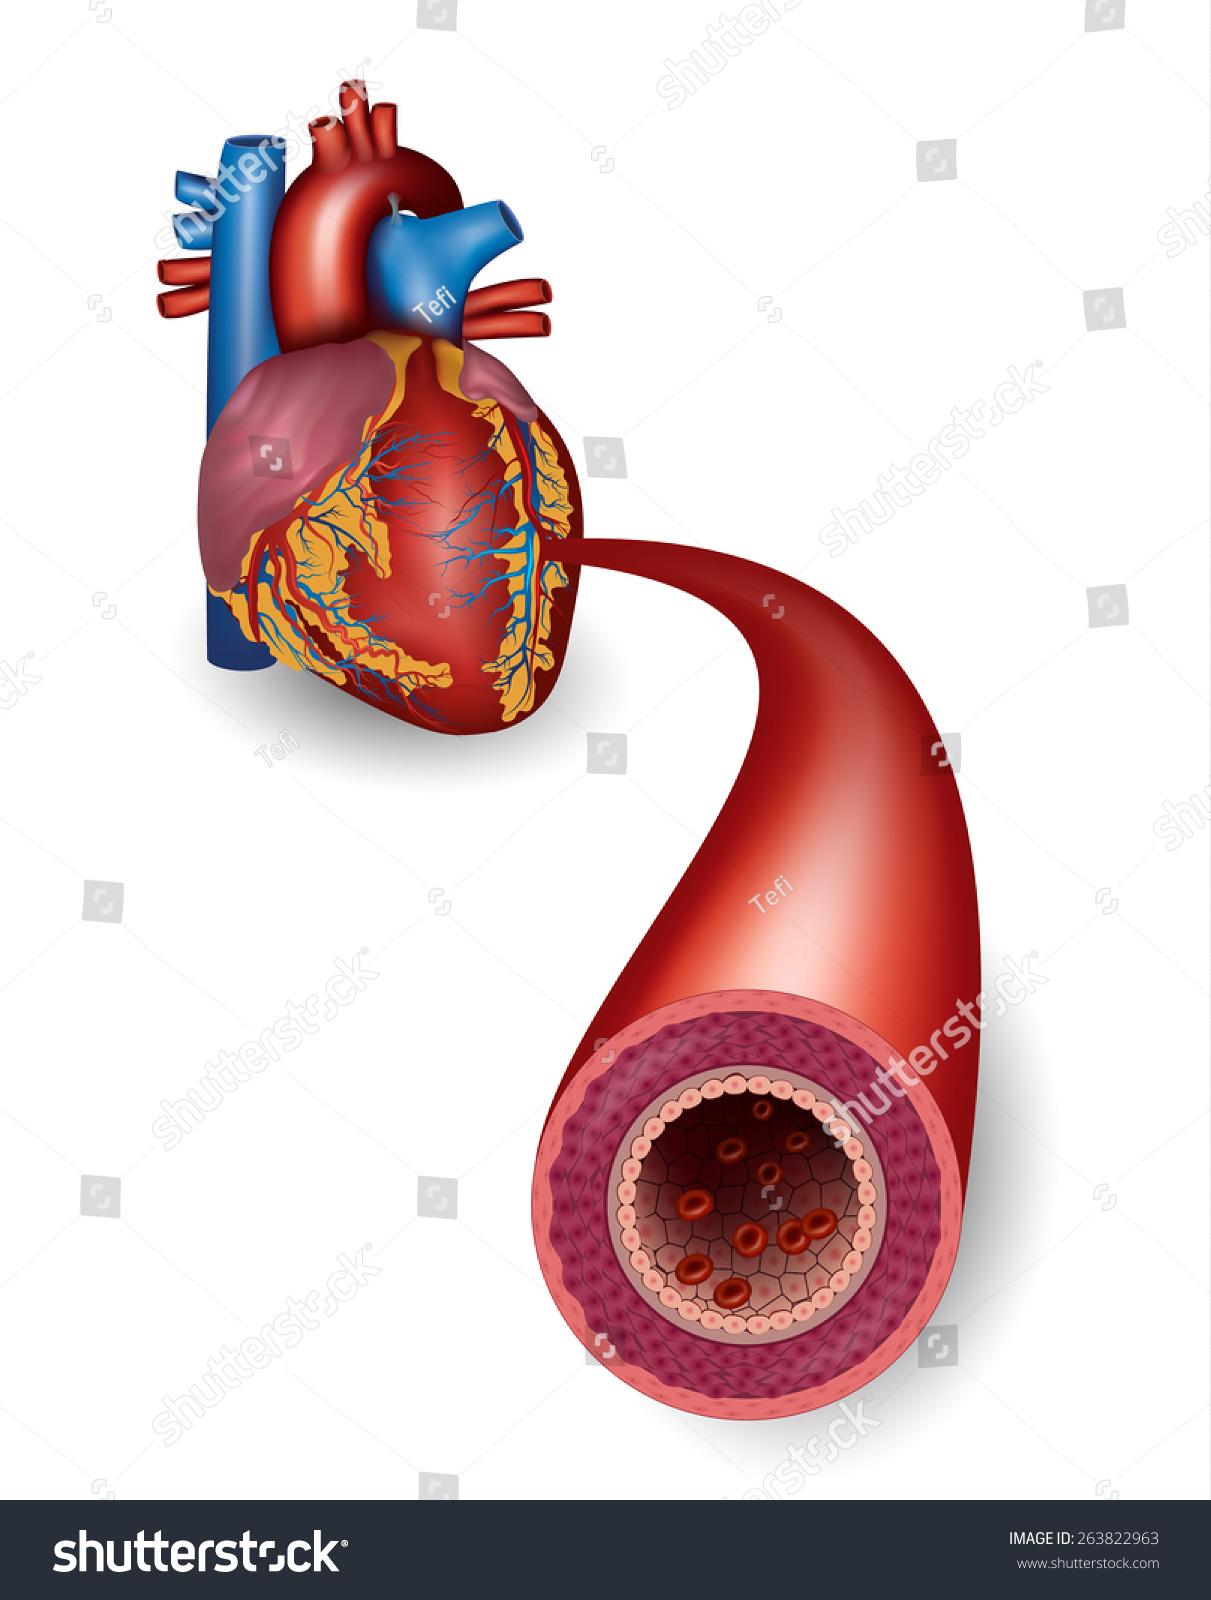 Healthy Artery Heart Anatomy Stock Vector 263822963 - Shutterstock